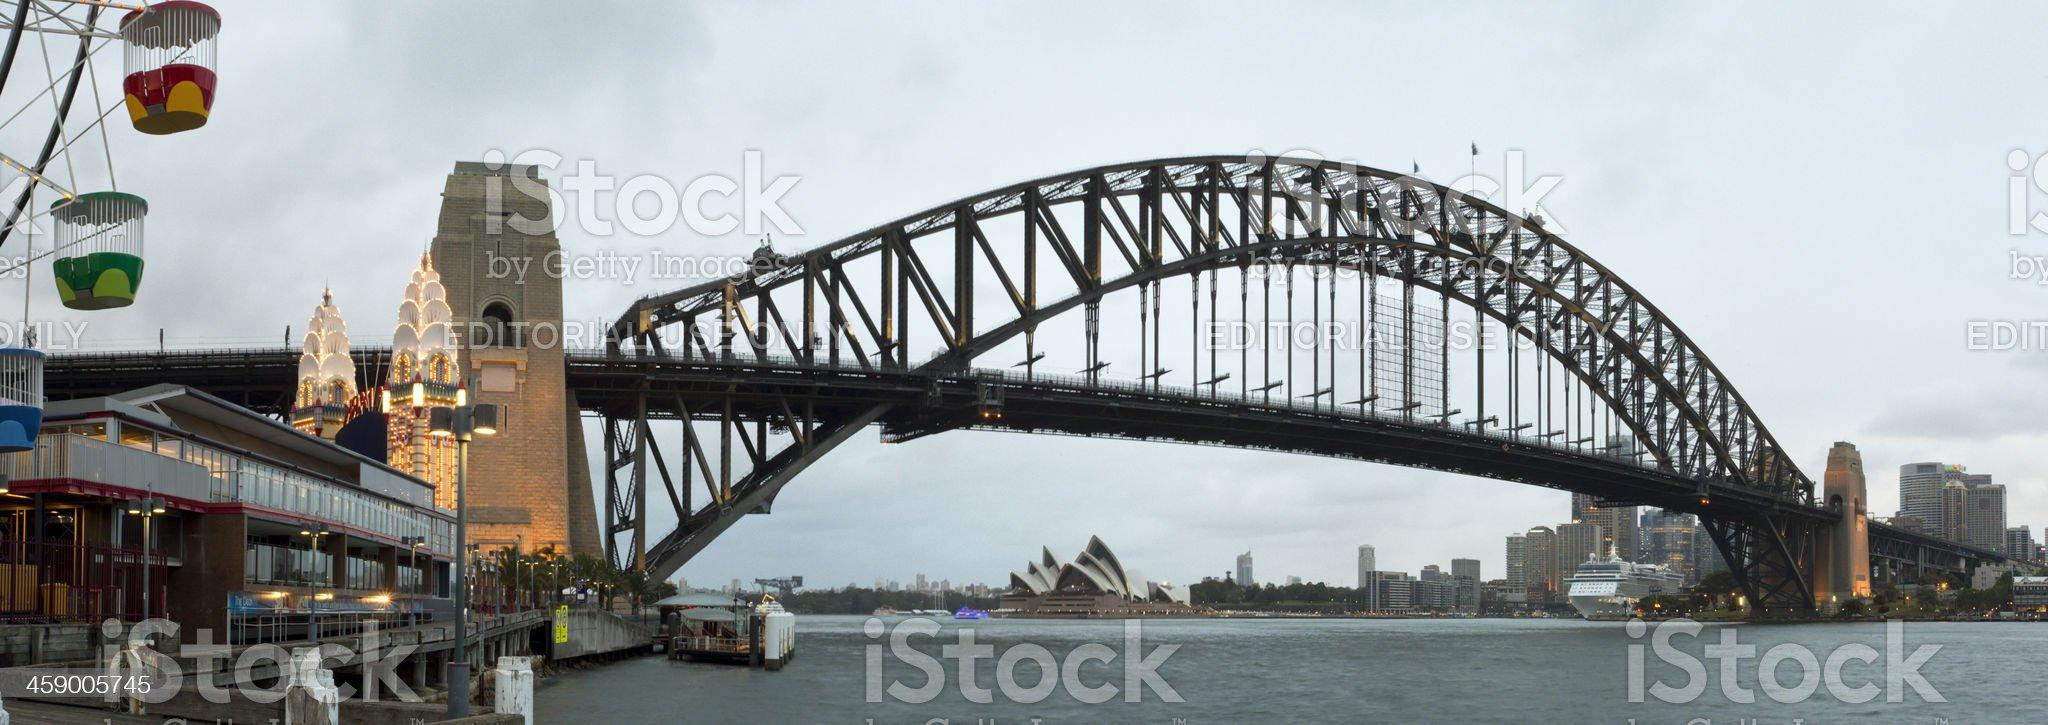 Sydney Harbour Bridge and Luna Park royalty-free stock photo